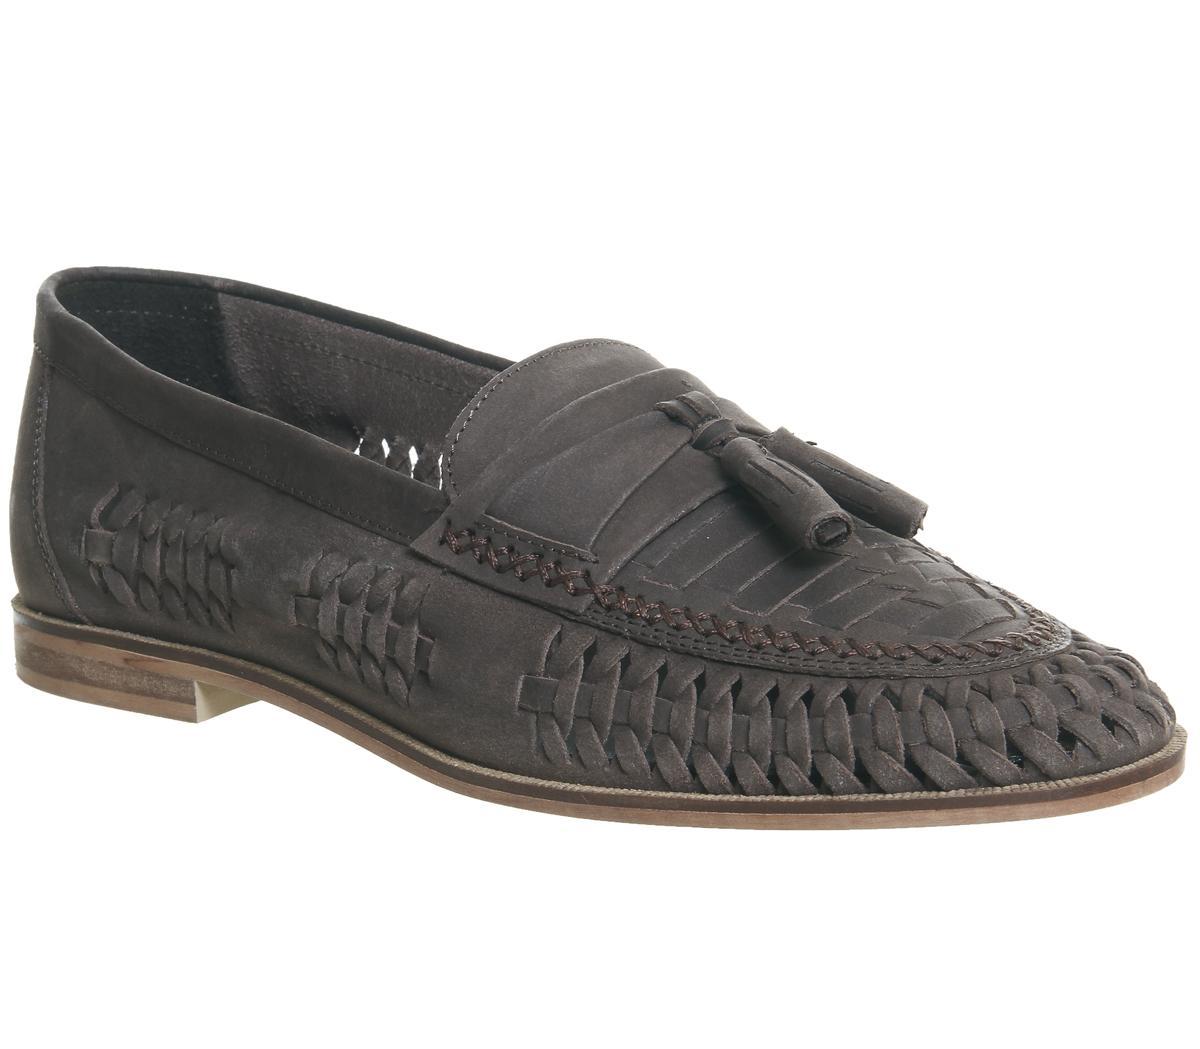 Finsbury Woven Tassle Loafers